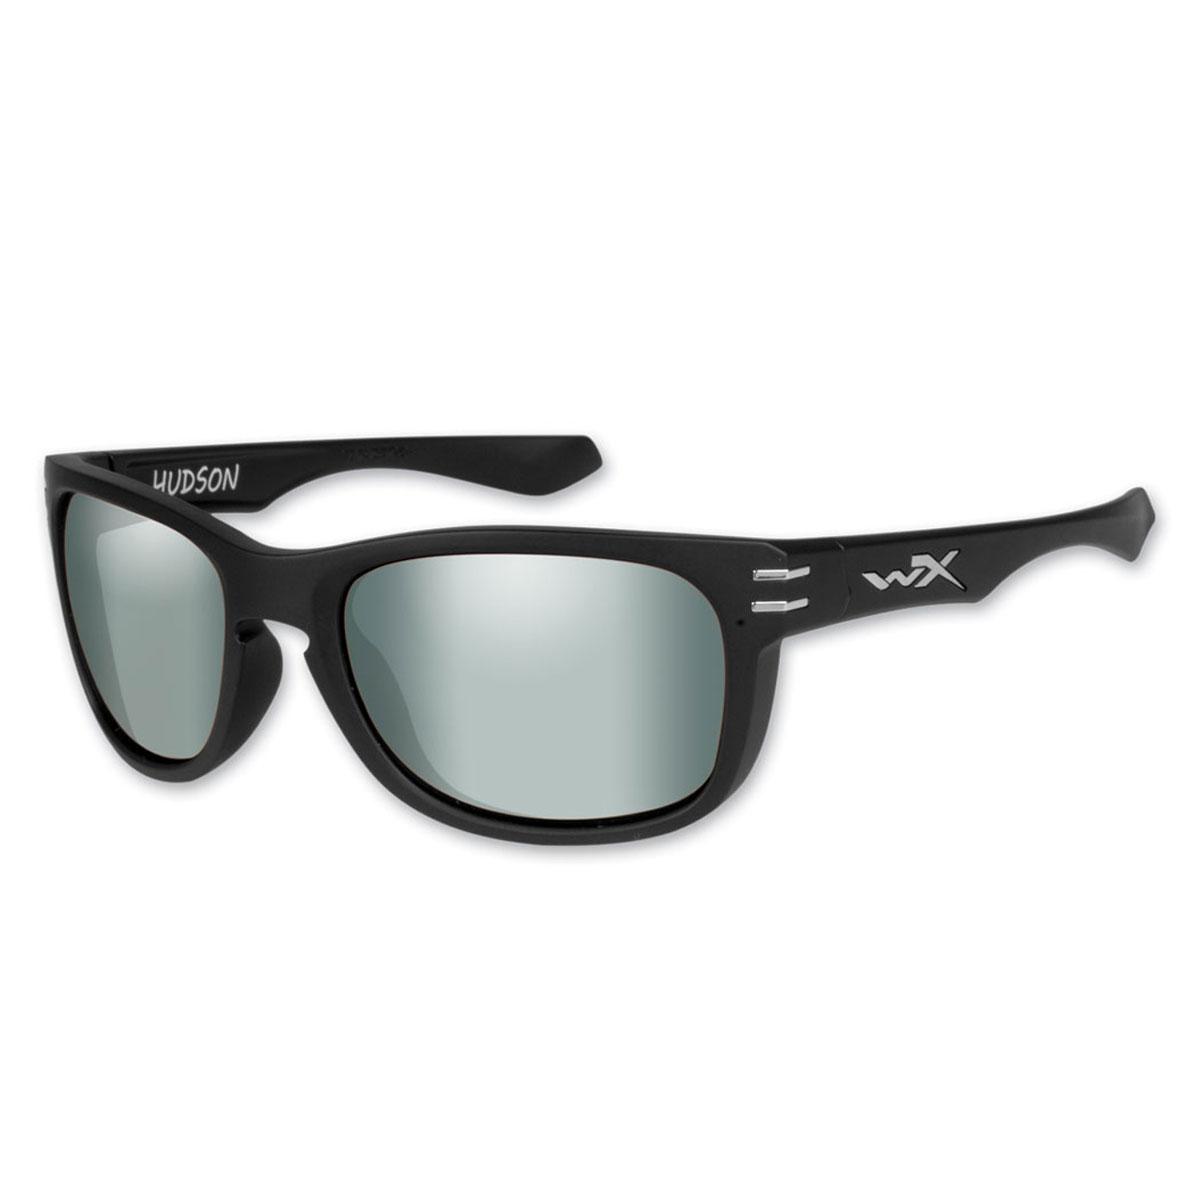 Wiley X Hudson Matte Black Sunglasses with Polorized Platinum Flash Lens